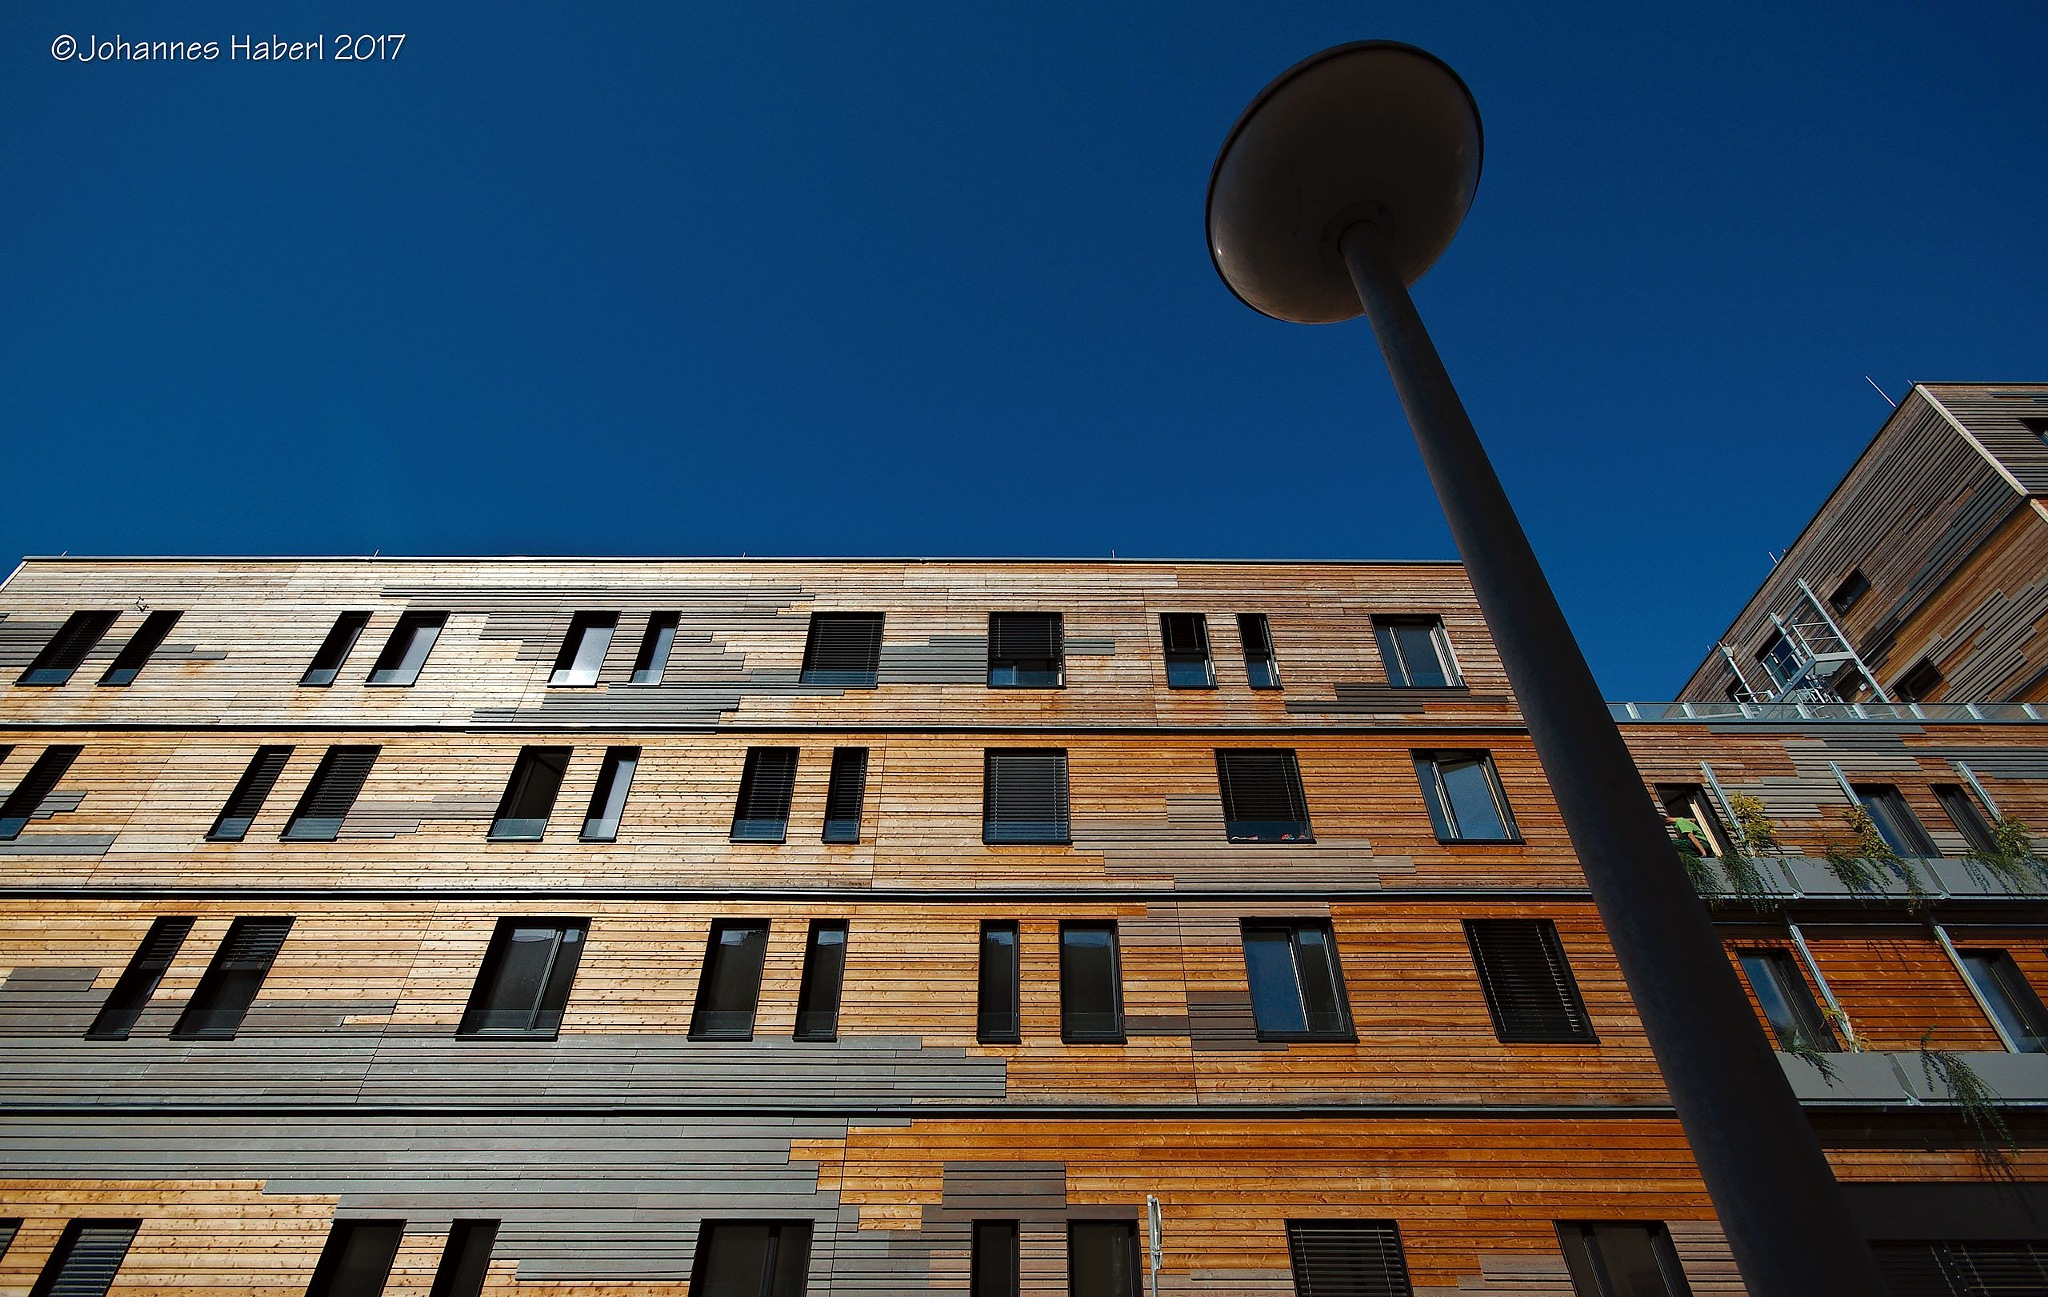 wooden facade III by Johannes Haberl